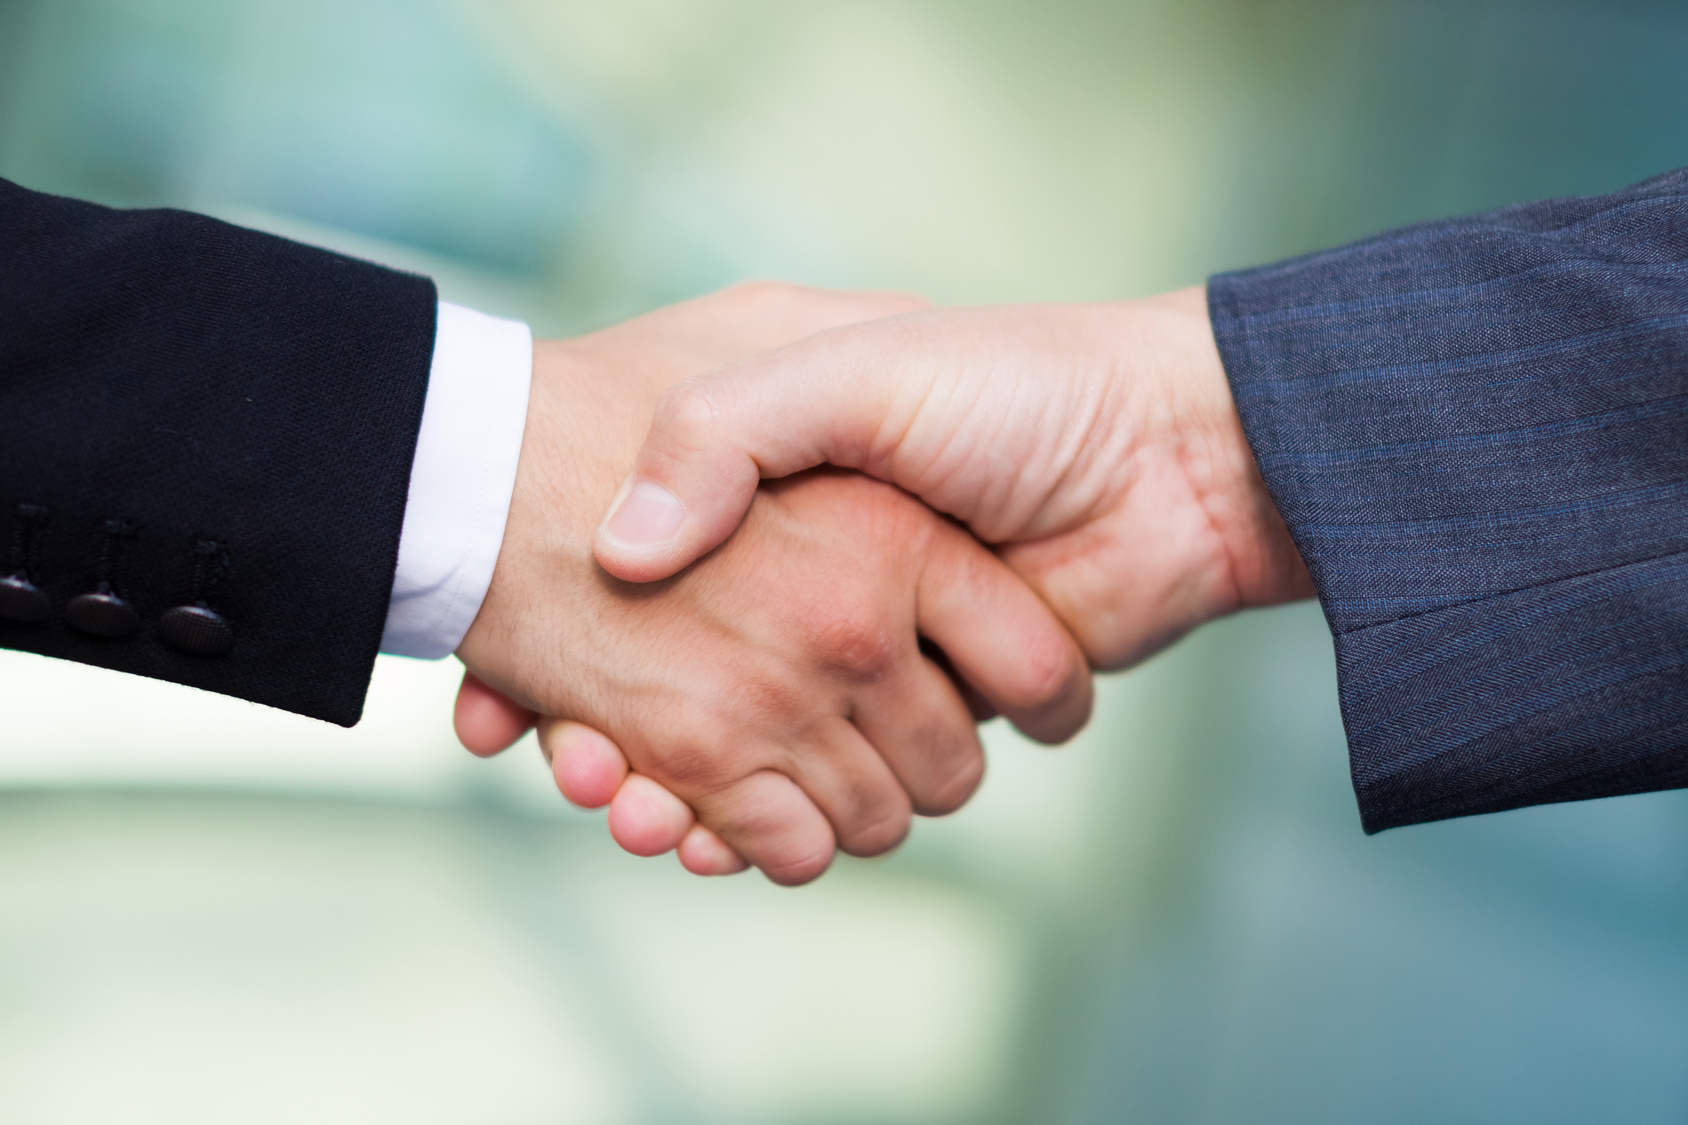 Картинки соглашение о сотрудничестве человечки